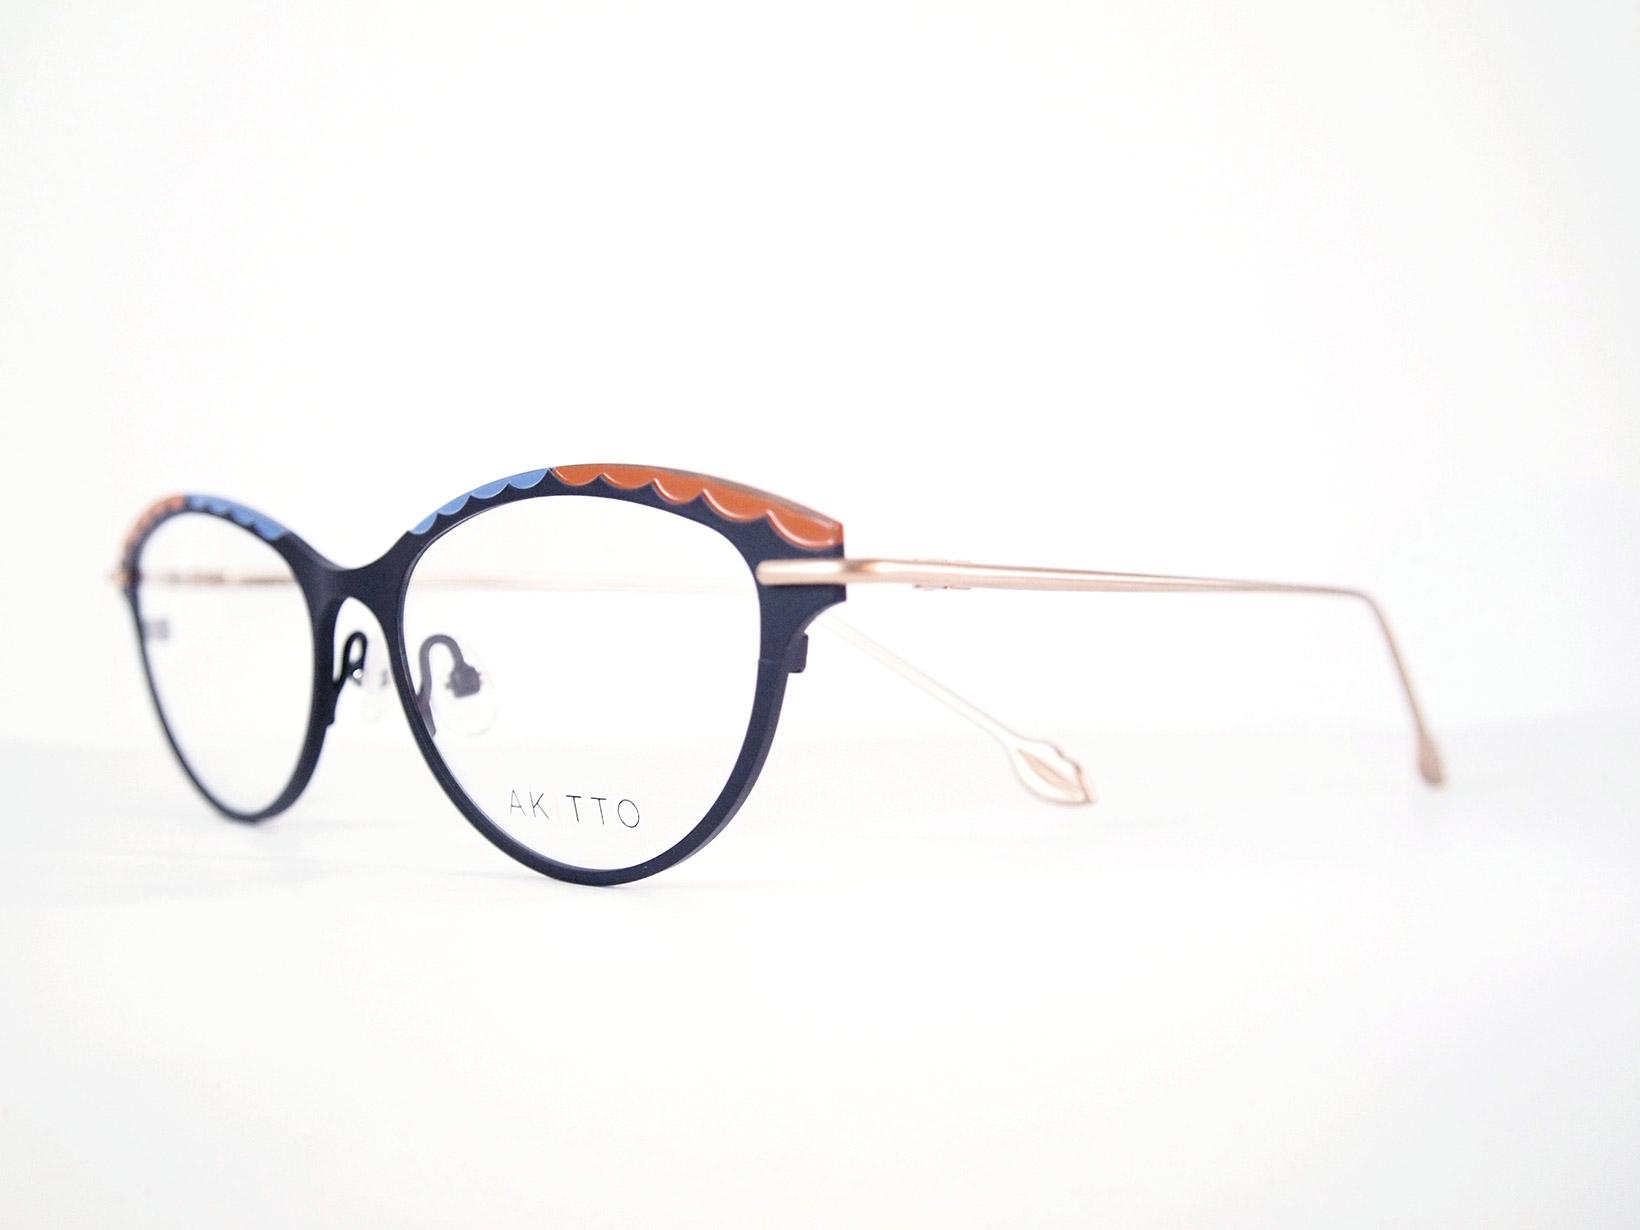 AKITTO 2017-4th cut color|NV size:50□16 material:titanium price:¥44,500-(+tax)